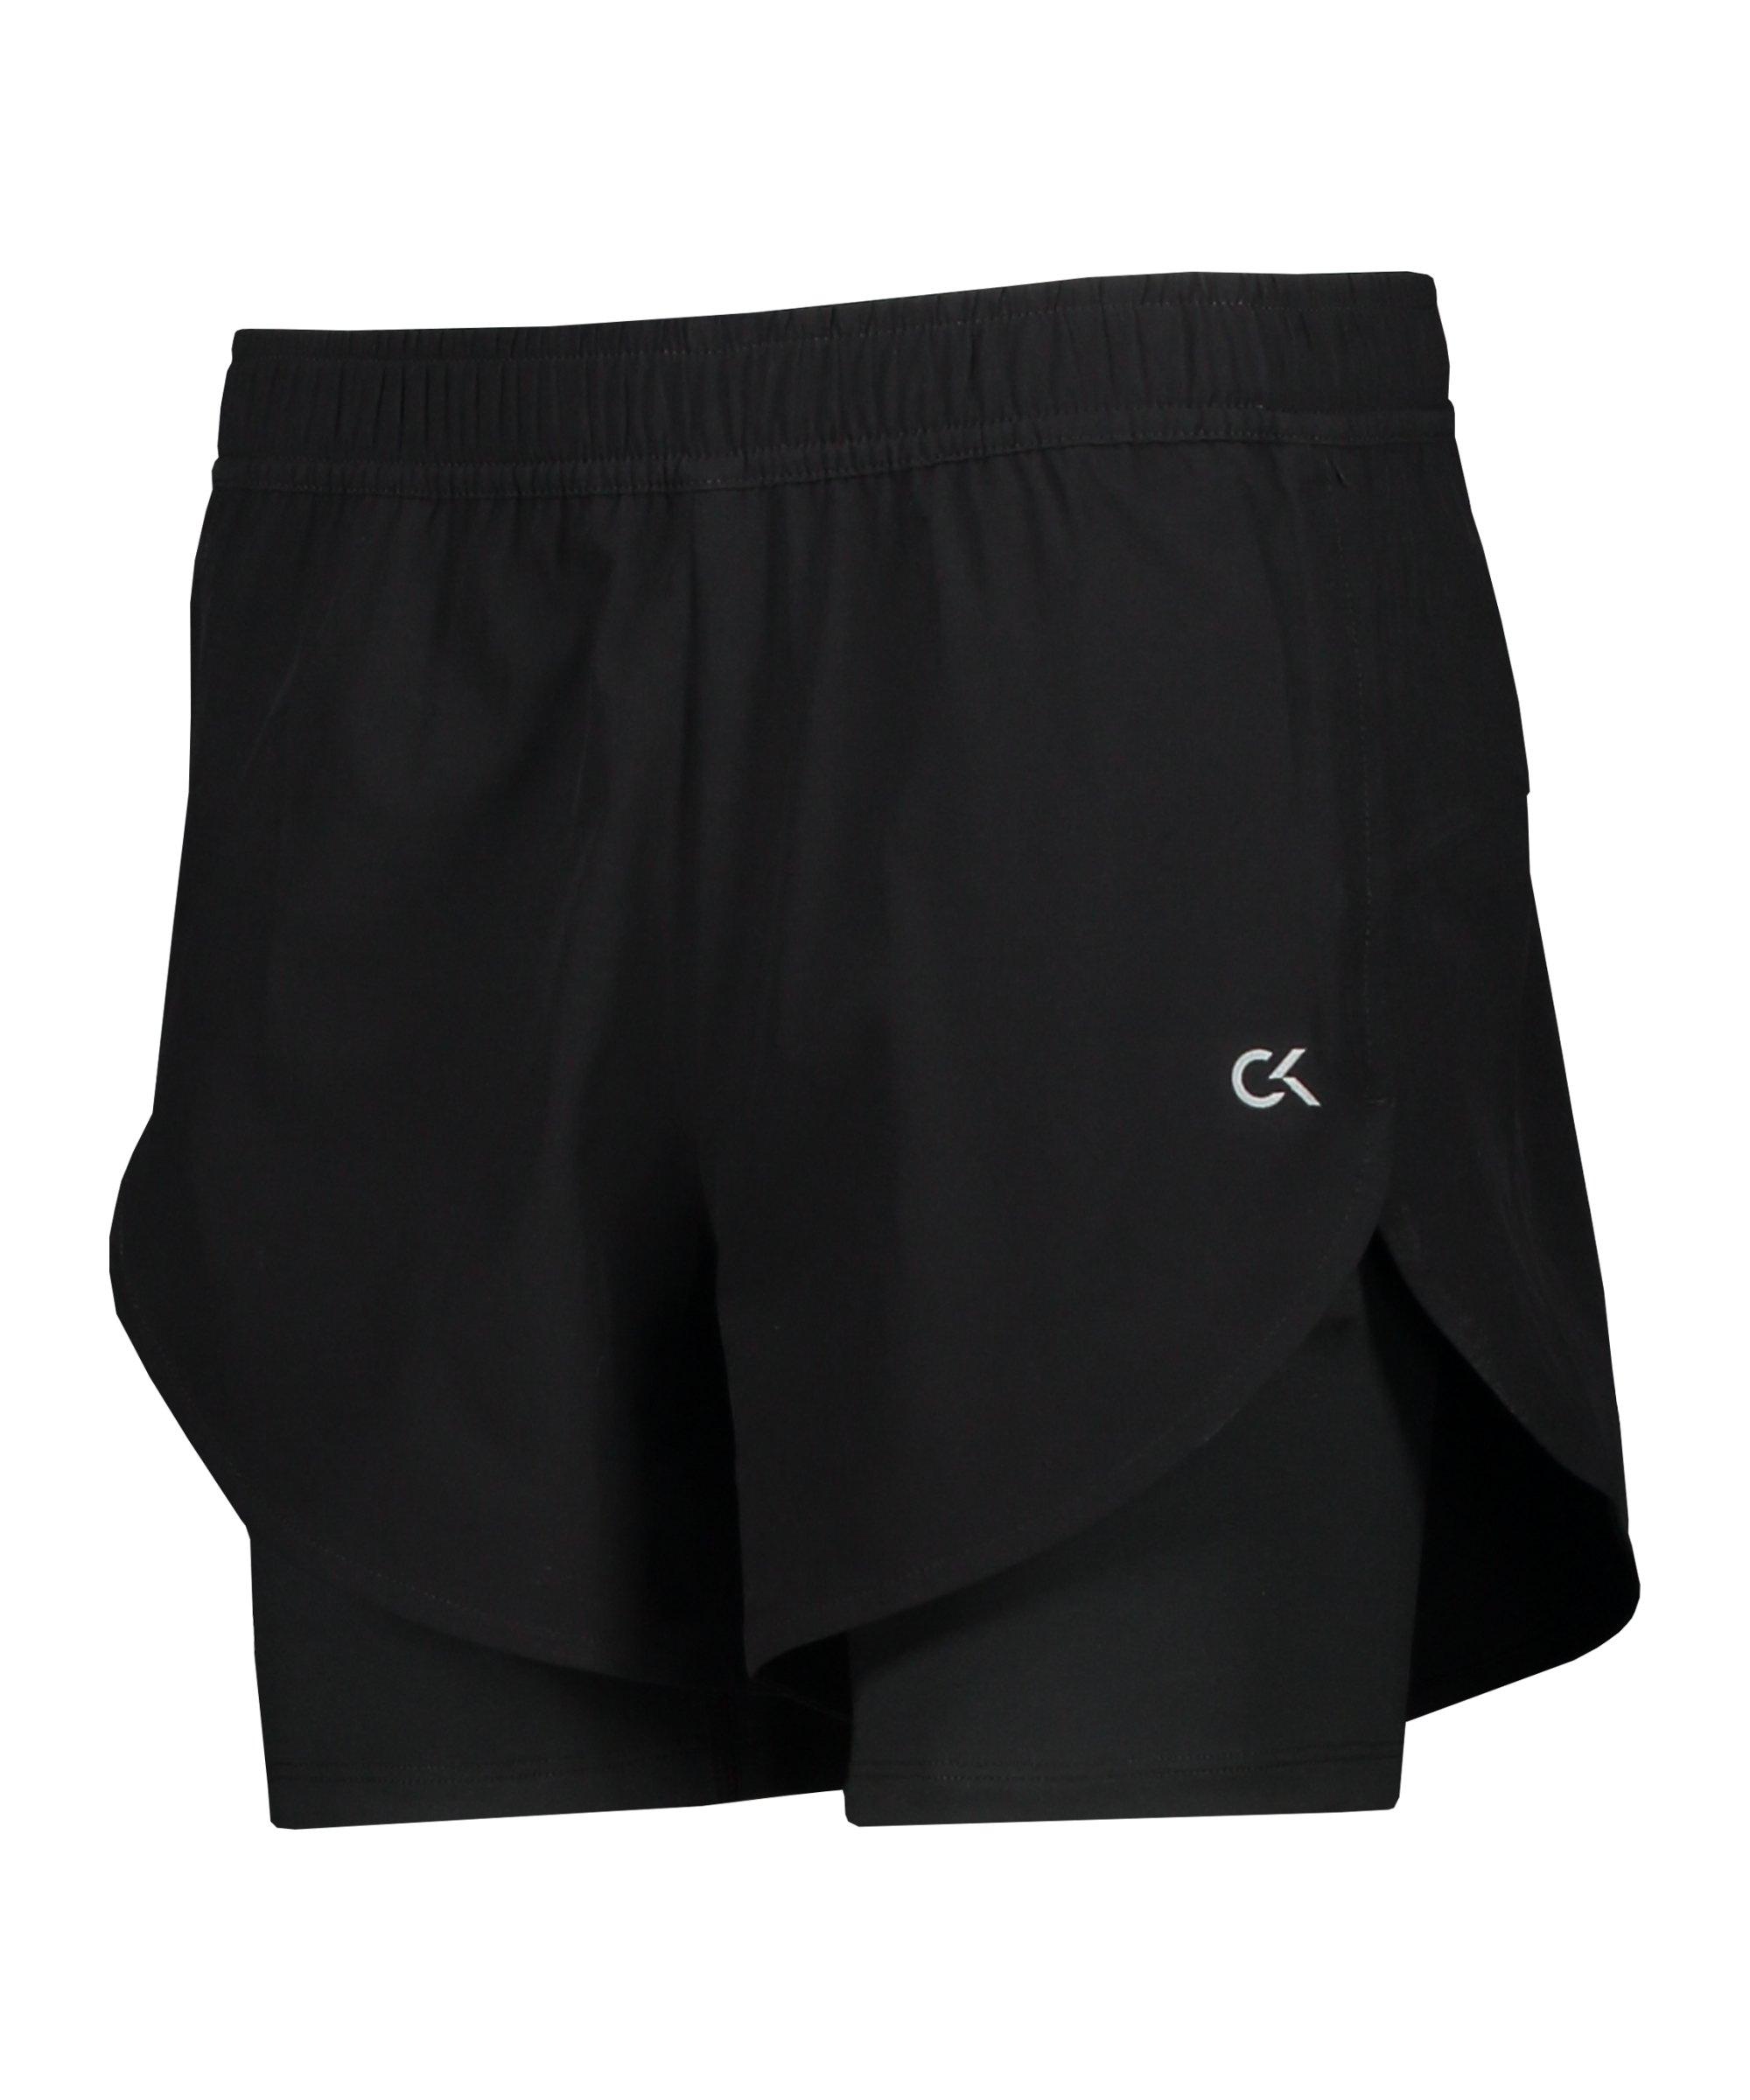 Calvin Klein Woven Short Damen Schwarz F007 - schwarz